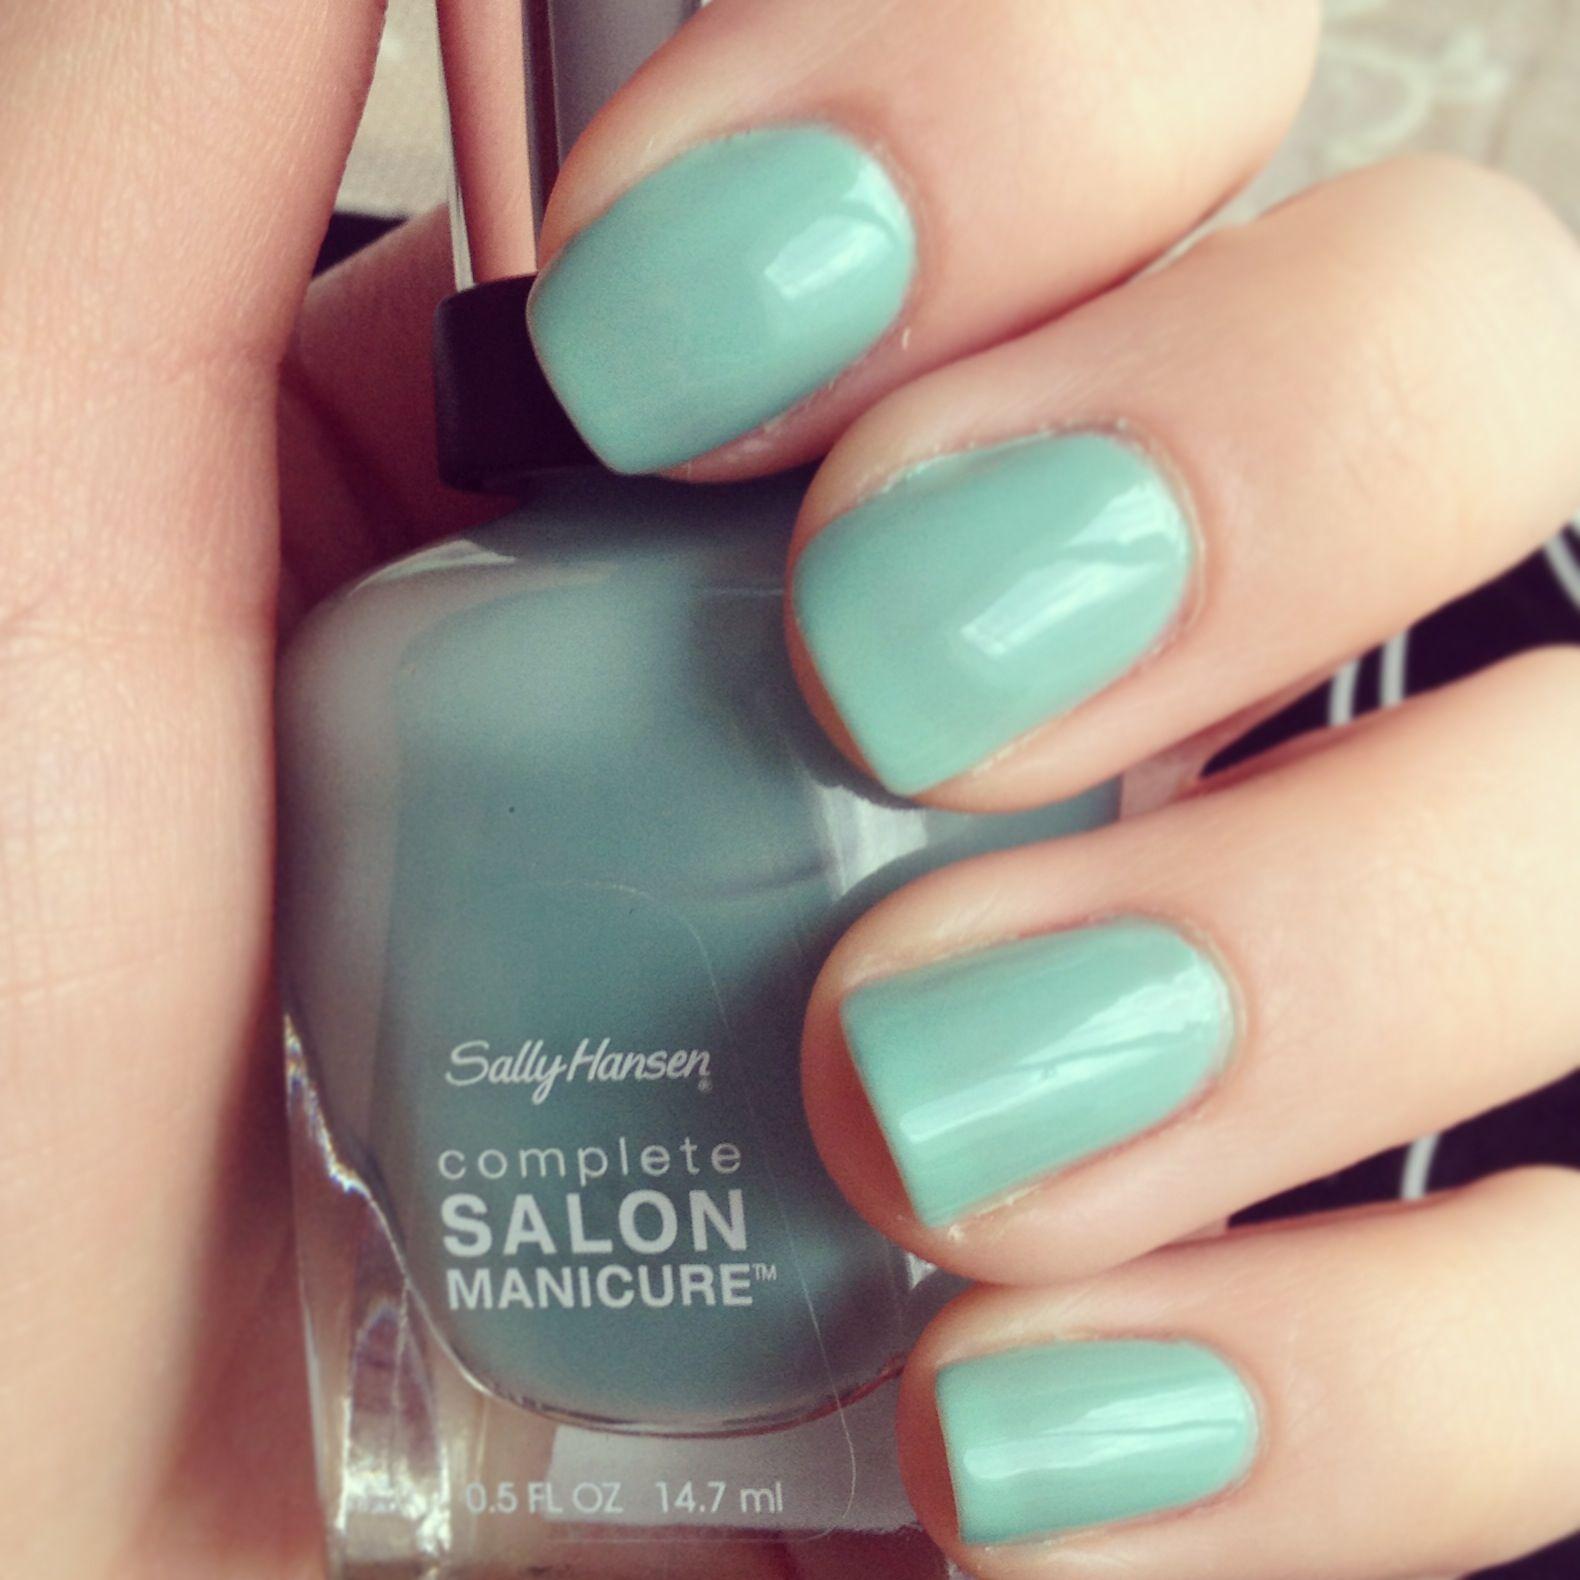 #SallyHansen Complete Salon #Manicure in #Jaded #mintnails #nailcolour #nailart